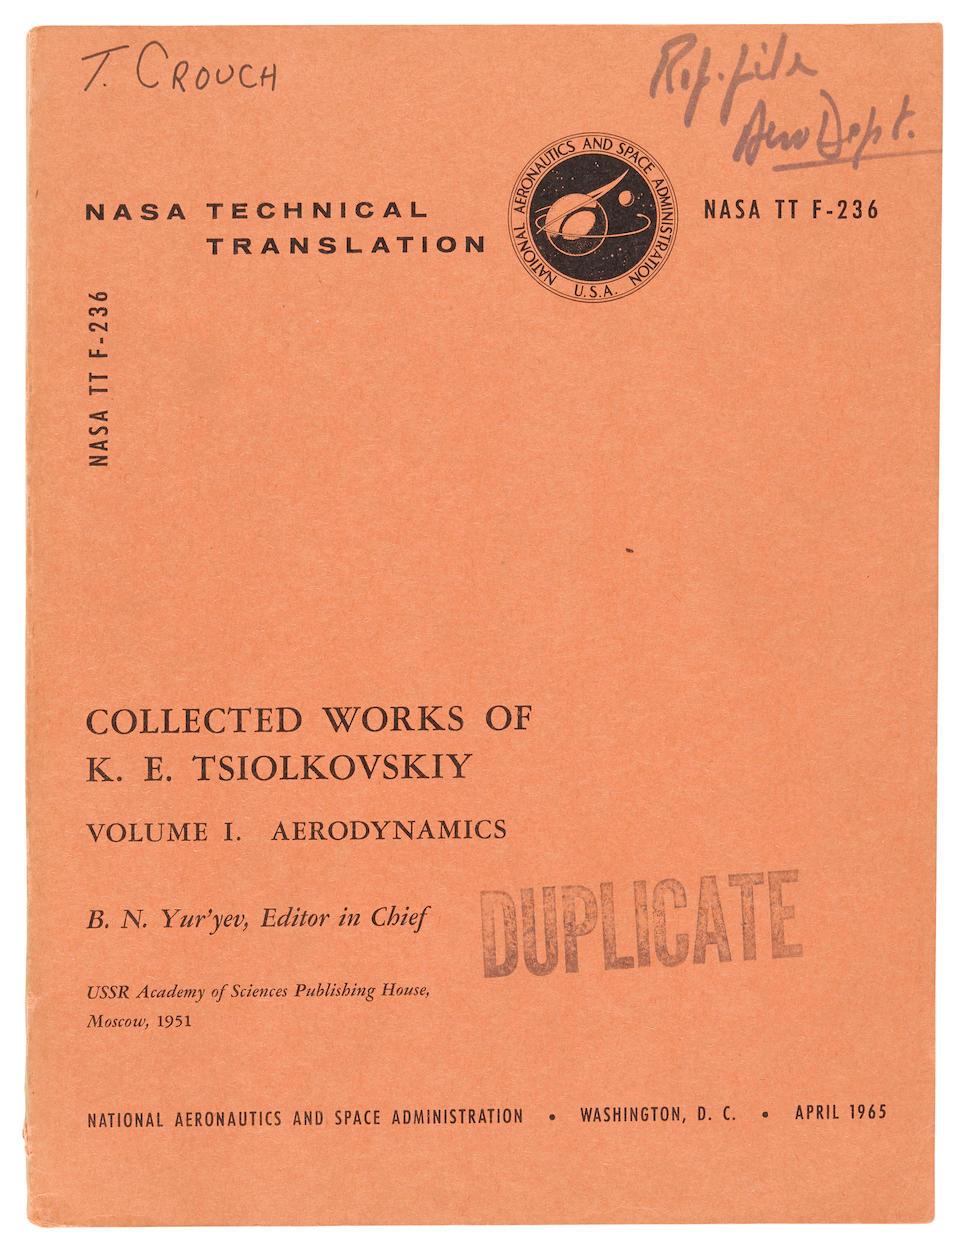 TSIOLKOVSKY's Works, with NASA TRANSLATIONS